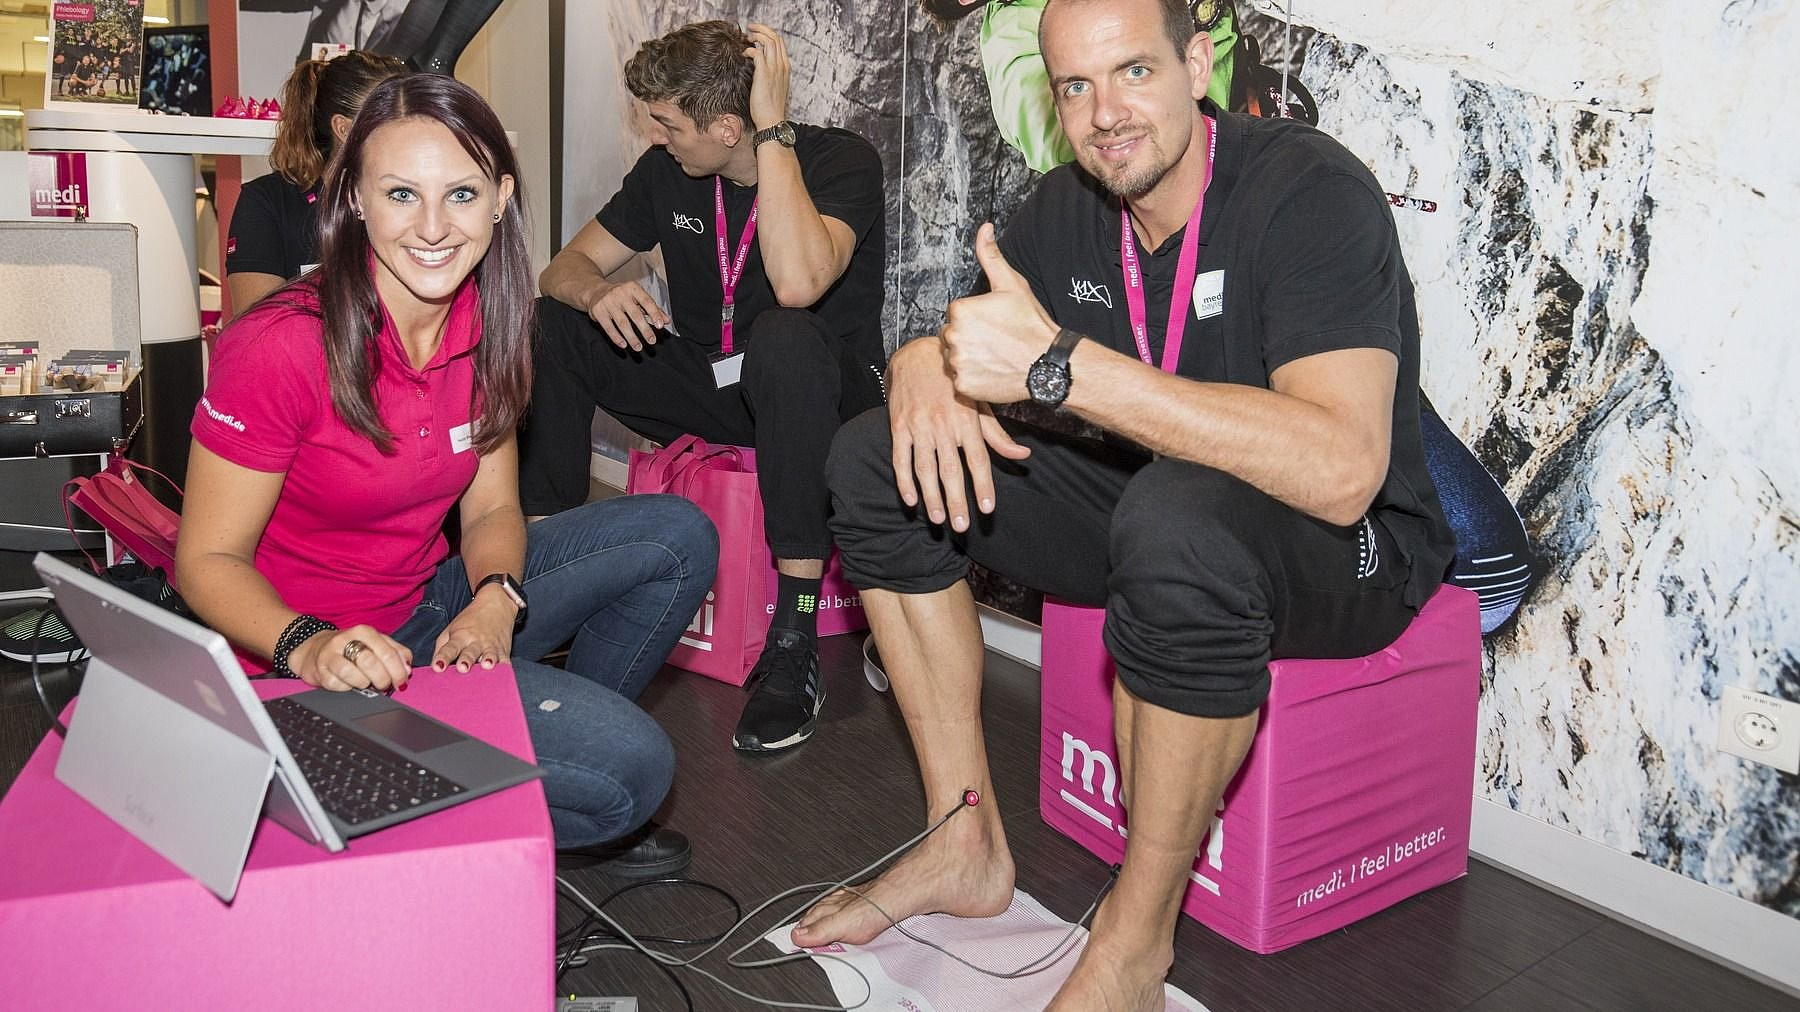 medi bayreuth Füße vermessen